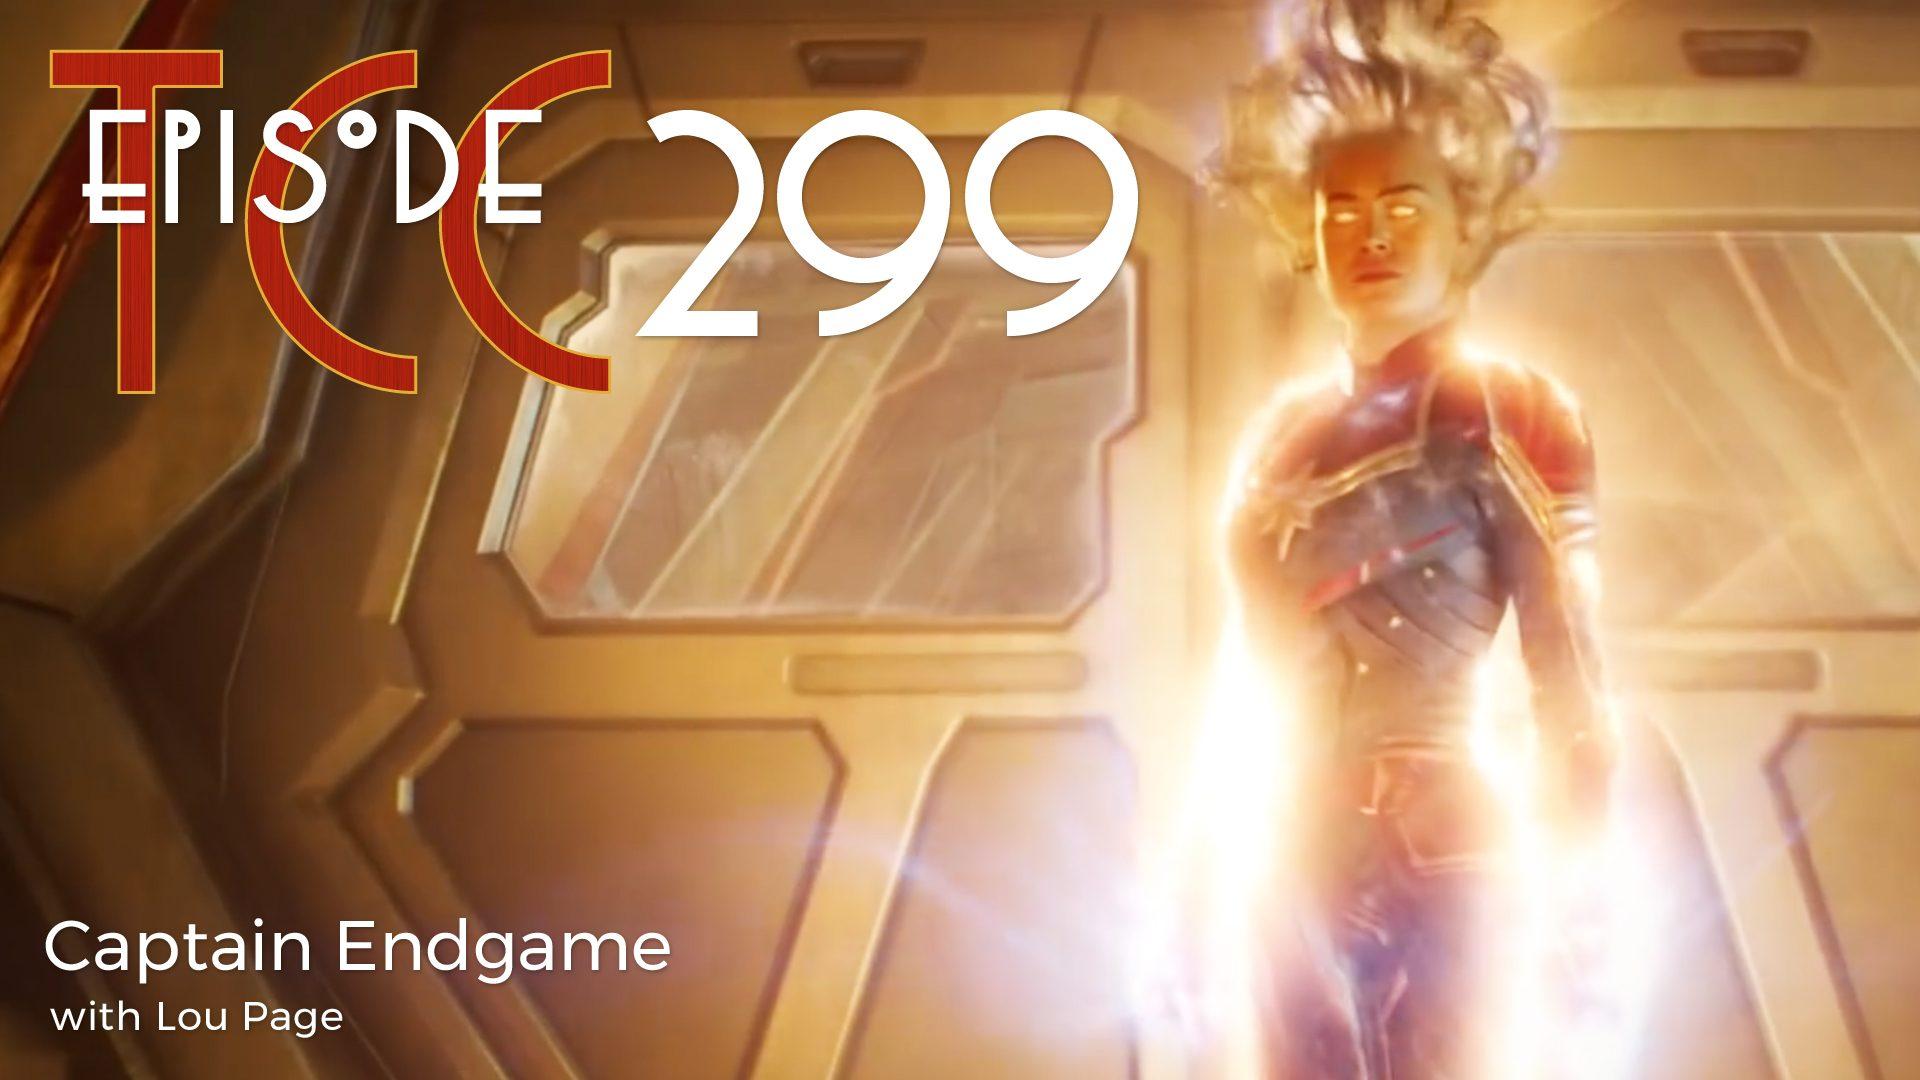 The Citadel Cafe 299: Captain Endgame